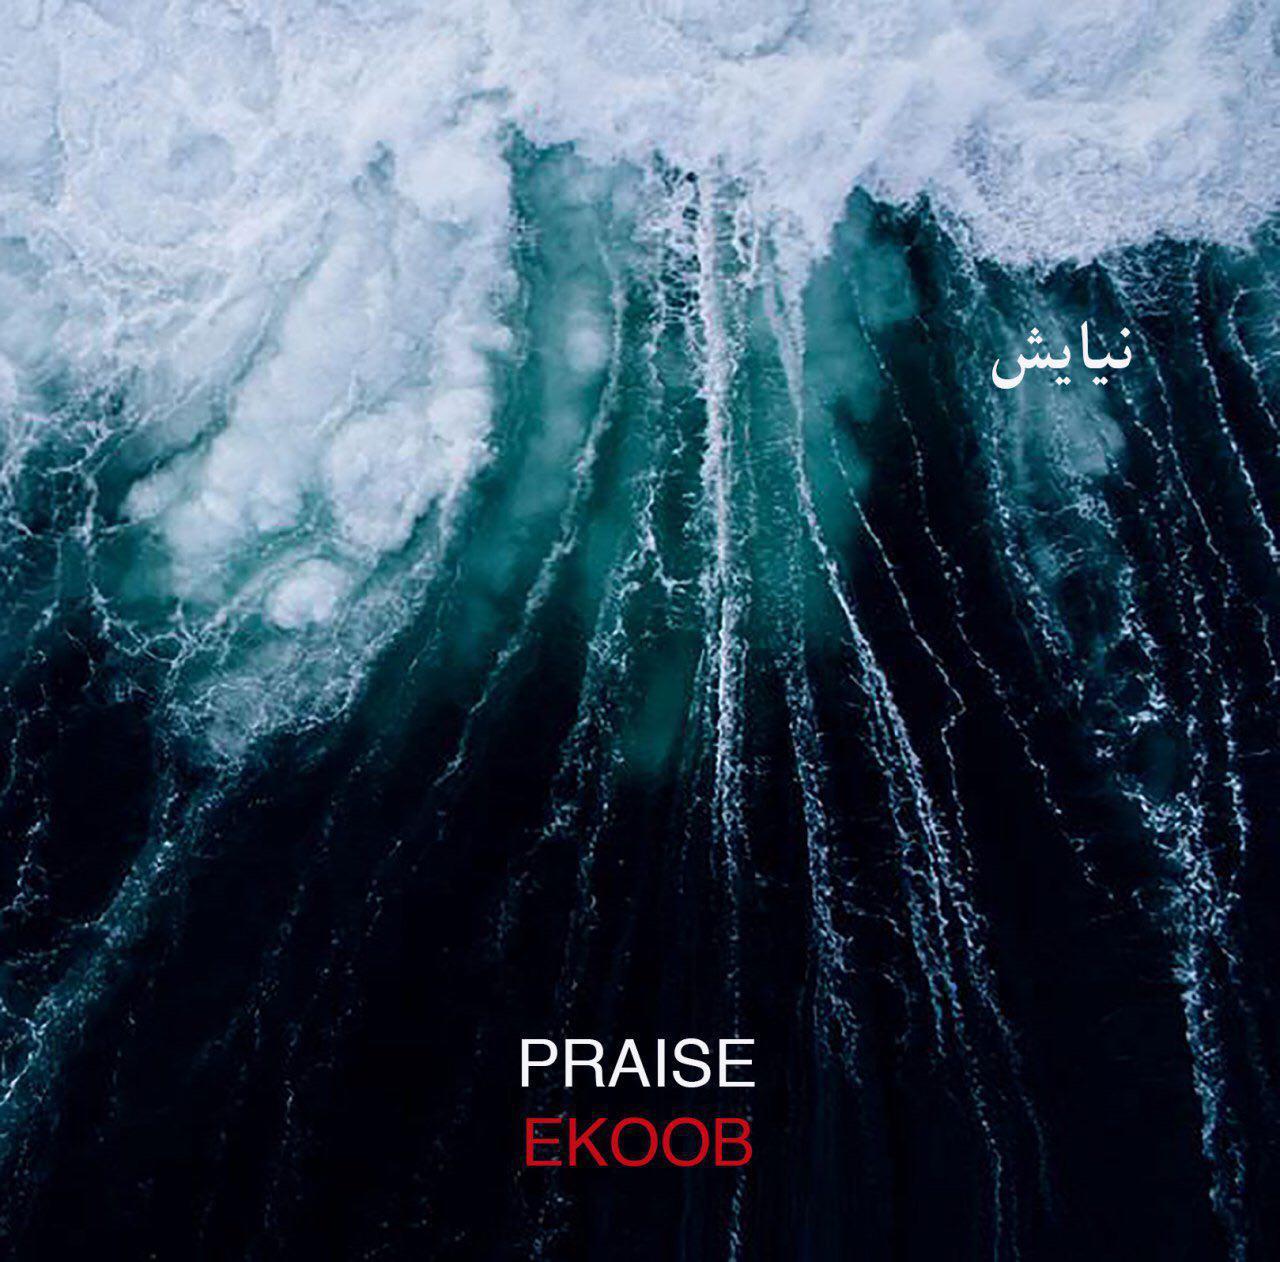 Ekoob – Praise